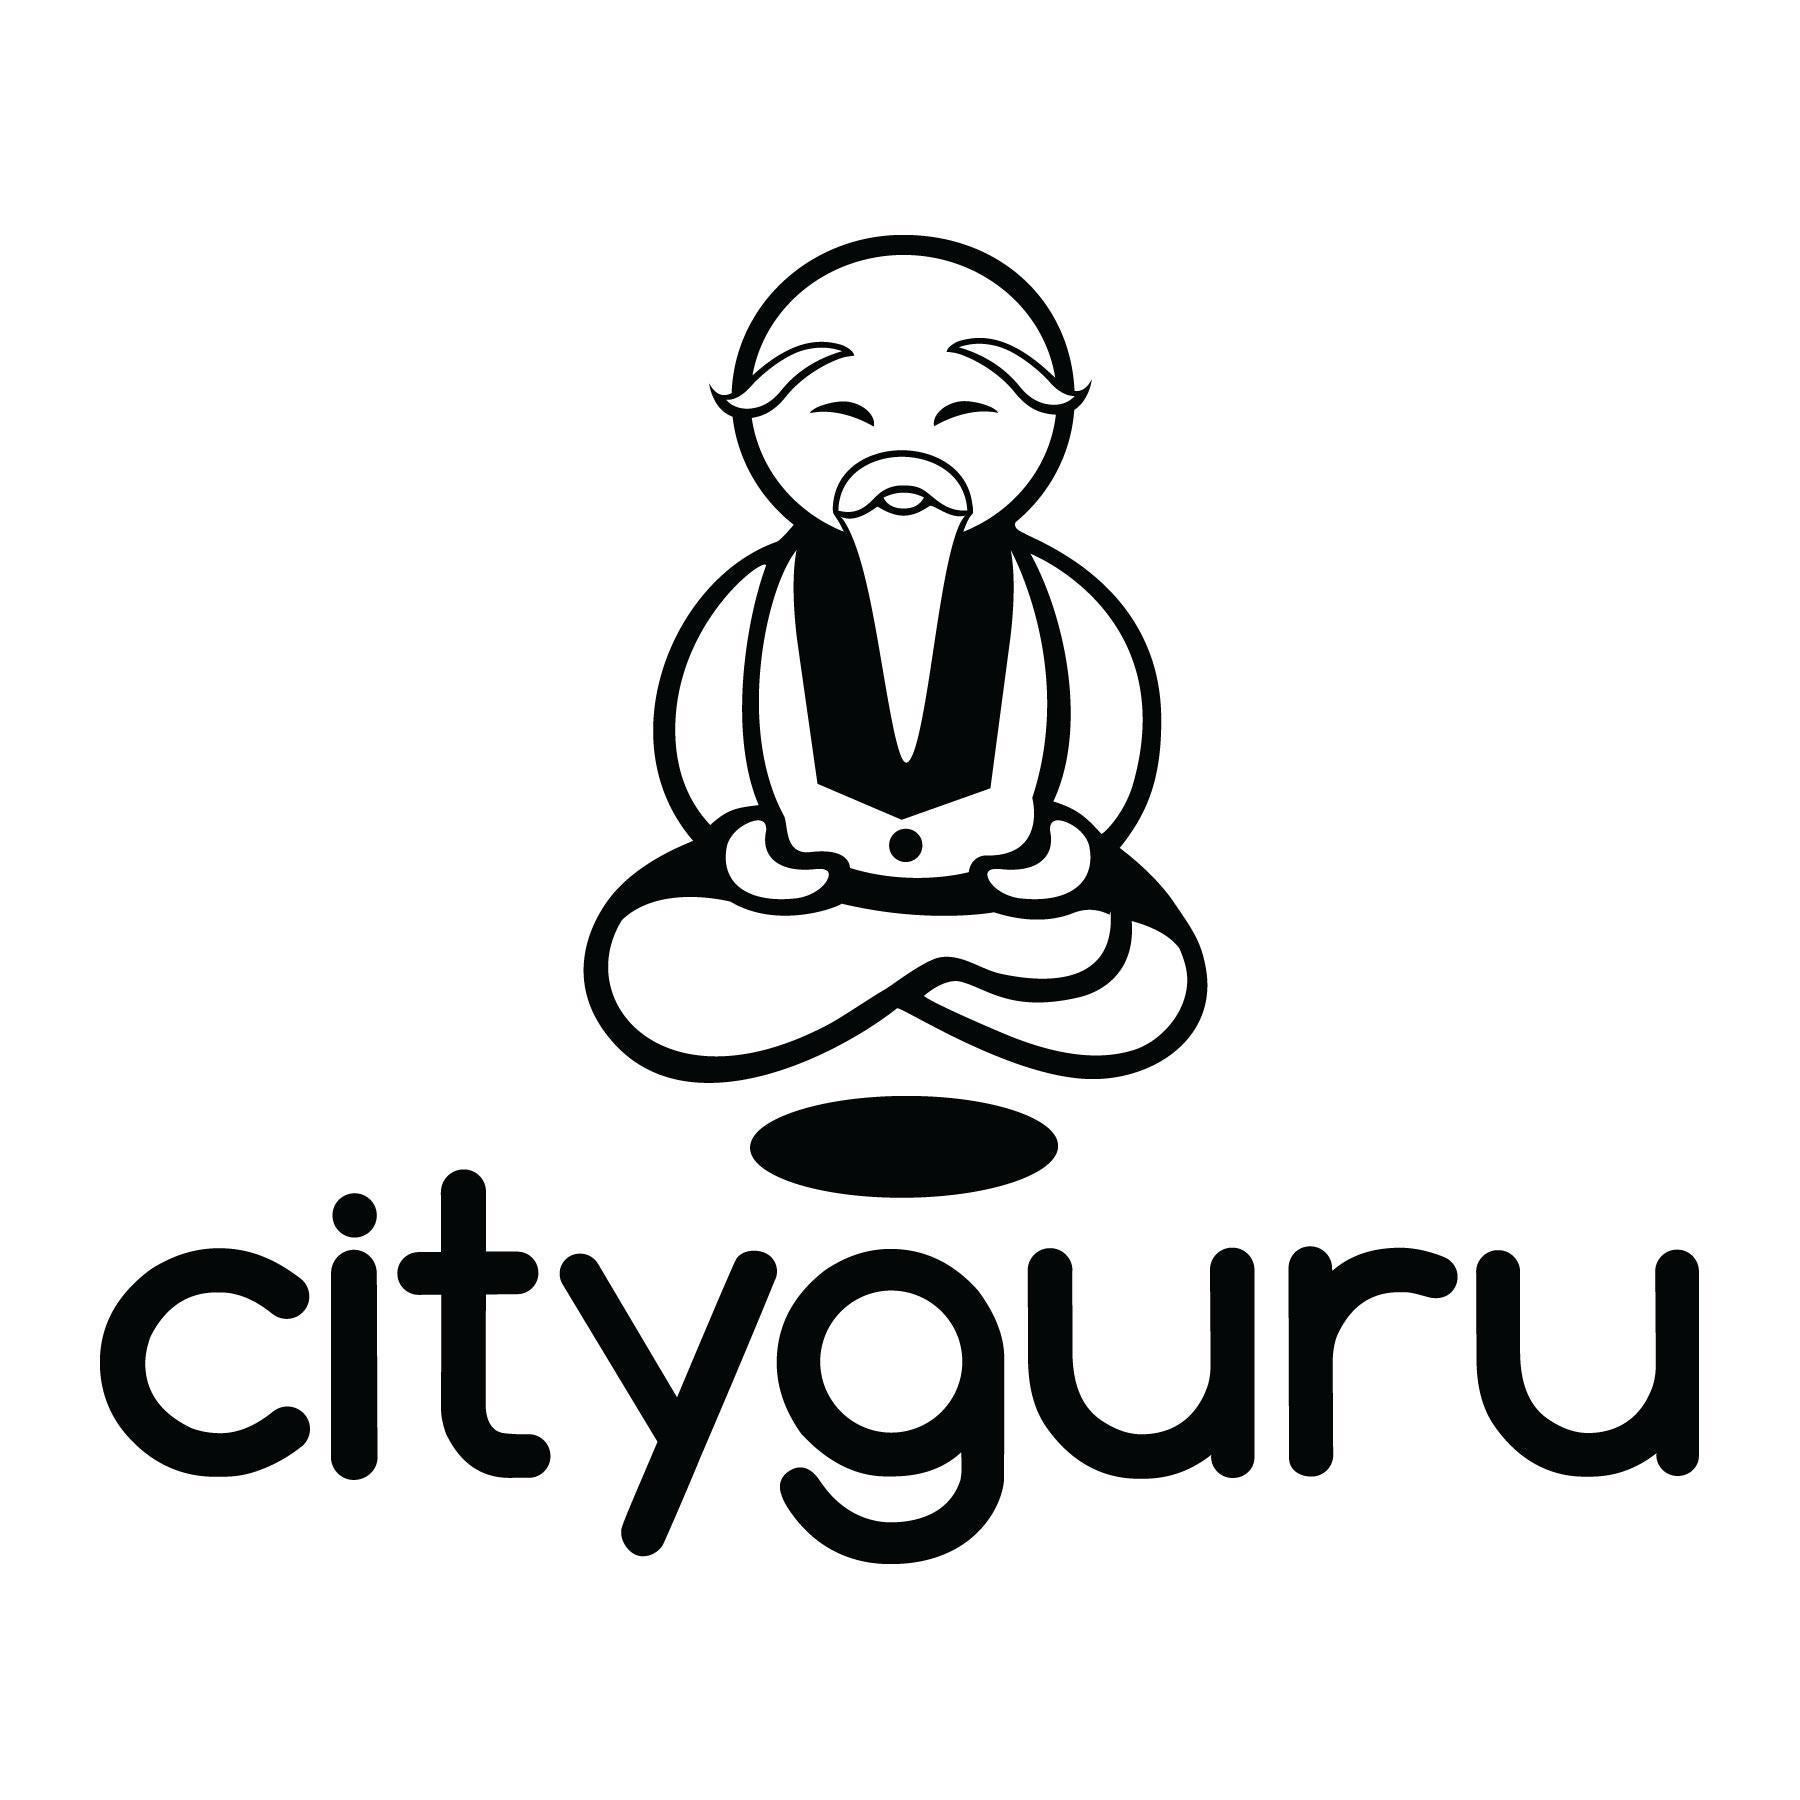 CityGuru company logo